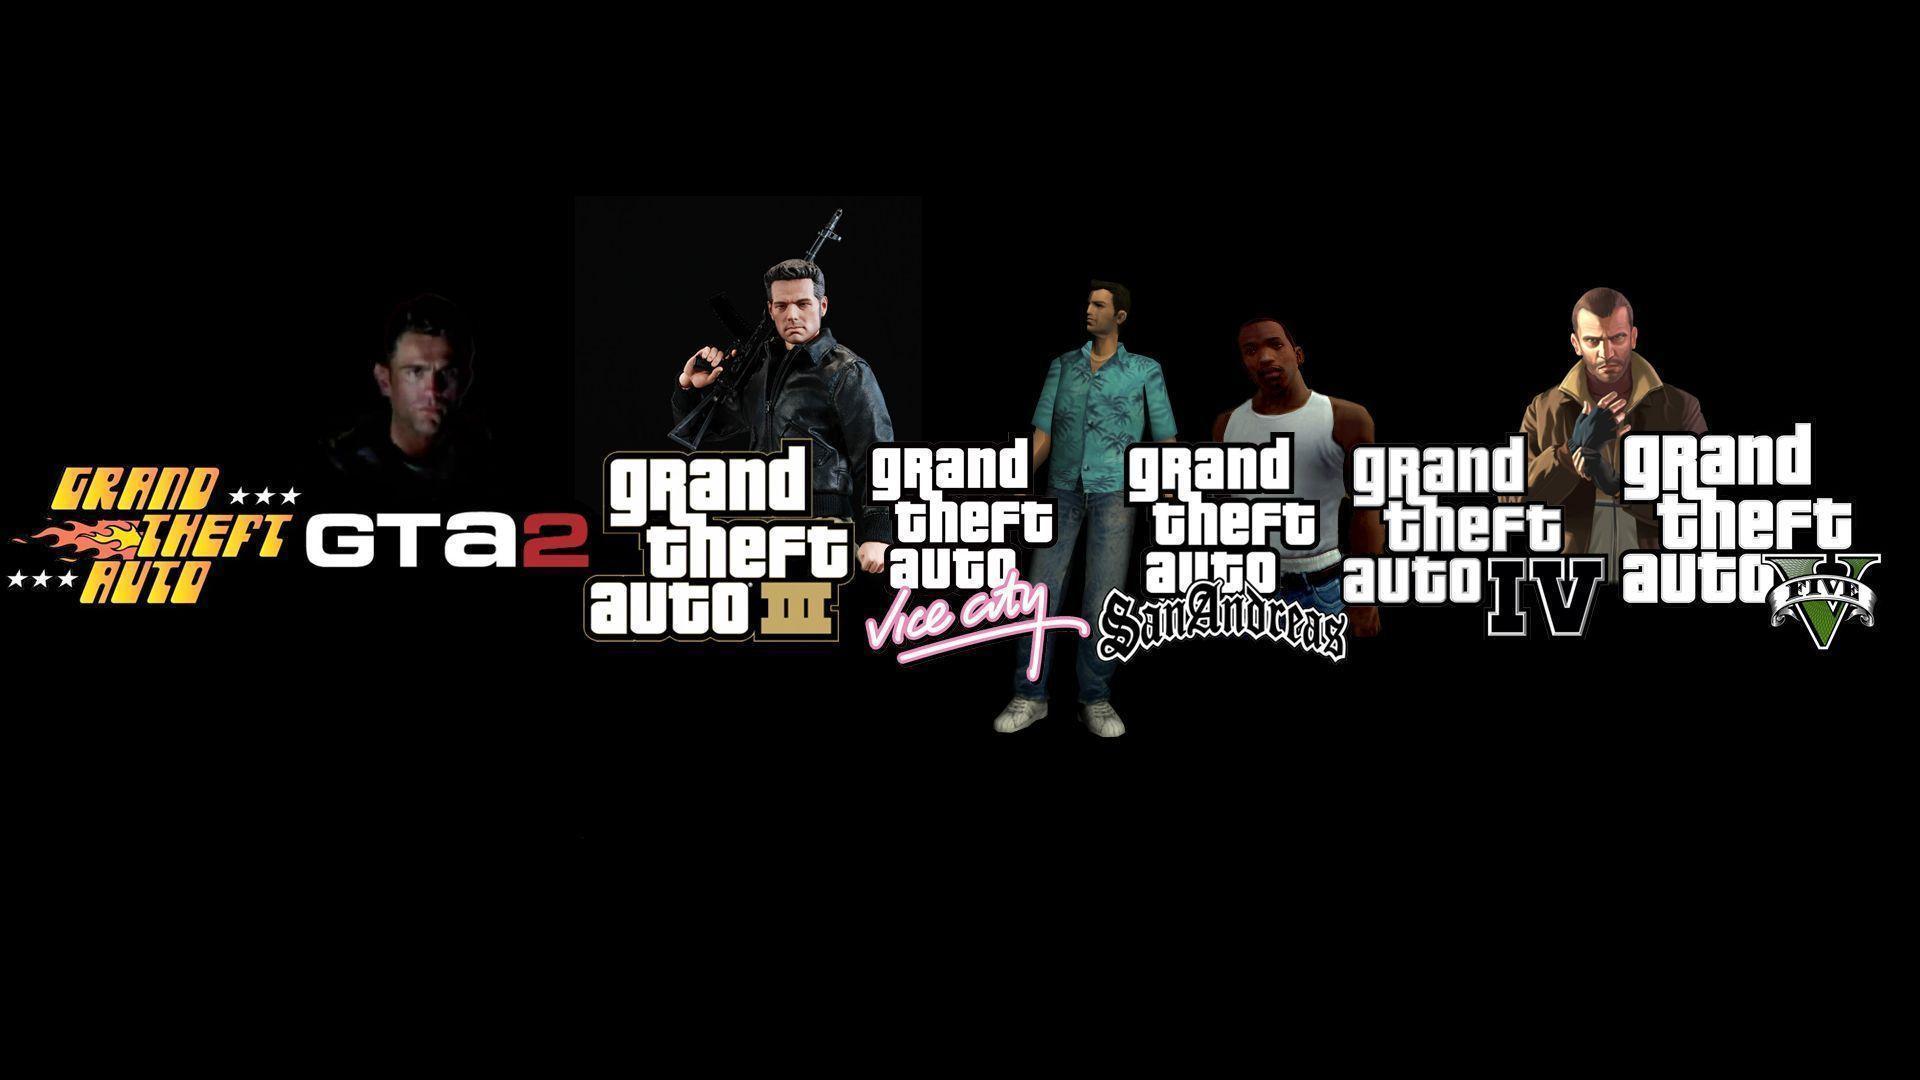 GTA Open World Game History Black Wallpaper